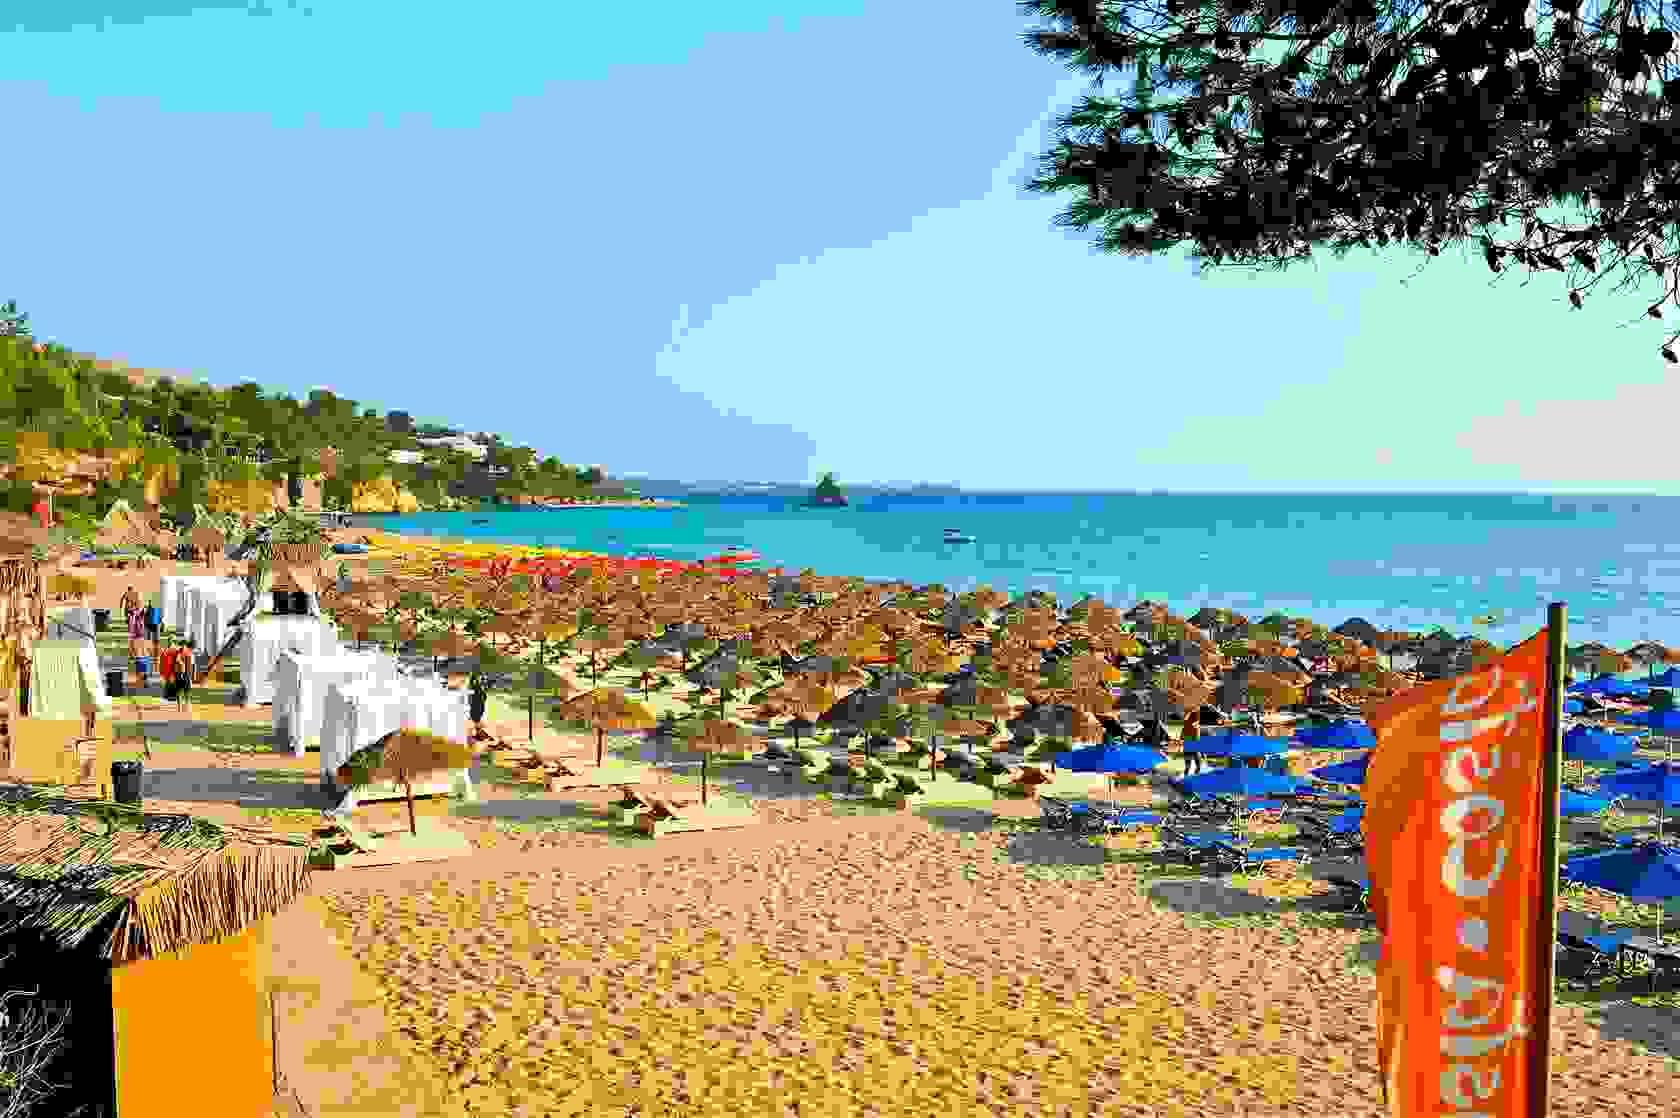 COSTA-COSTA: ΚΥΡΙΑΚΗ 8 ΙΟΥΝΙΟΥ-ΤΟ ΠΡΩΤΟ BEACH PARTY ΤΟΥ ΚΑΛΟΚΑΙΡΙΟΥ